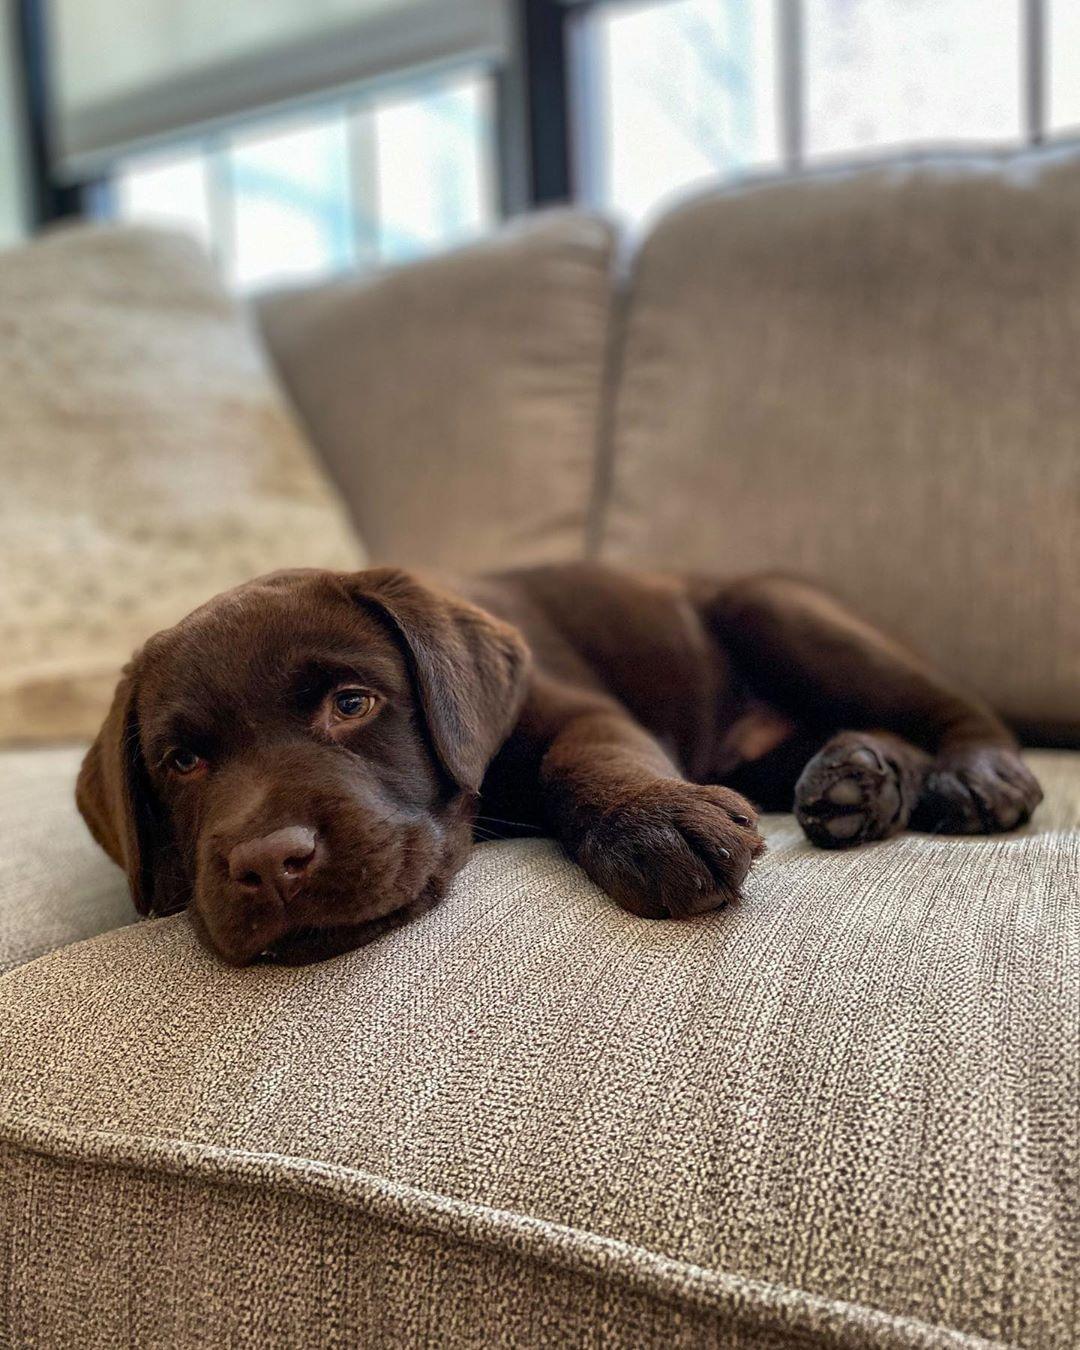 Pin By Ellen Rossmiller On Doggies In 2020 Labrador Retriever Labrador Lab Dogs